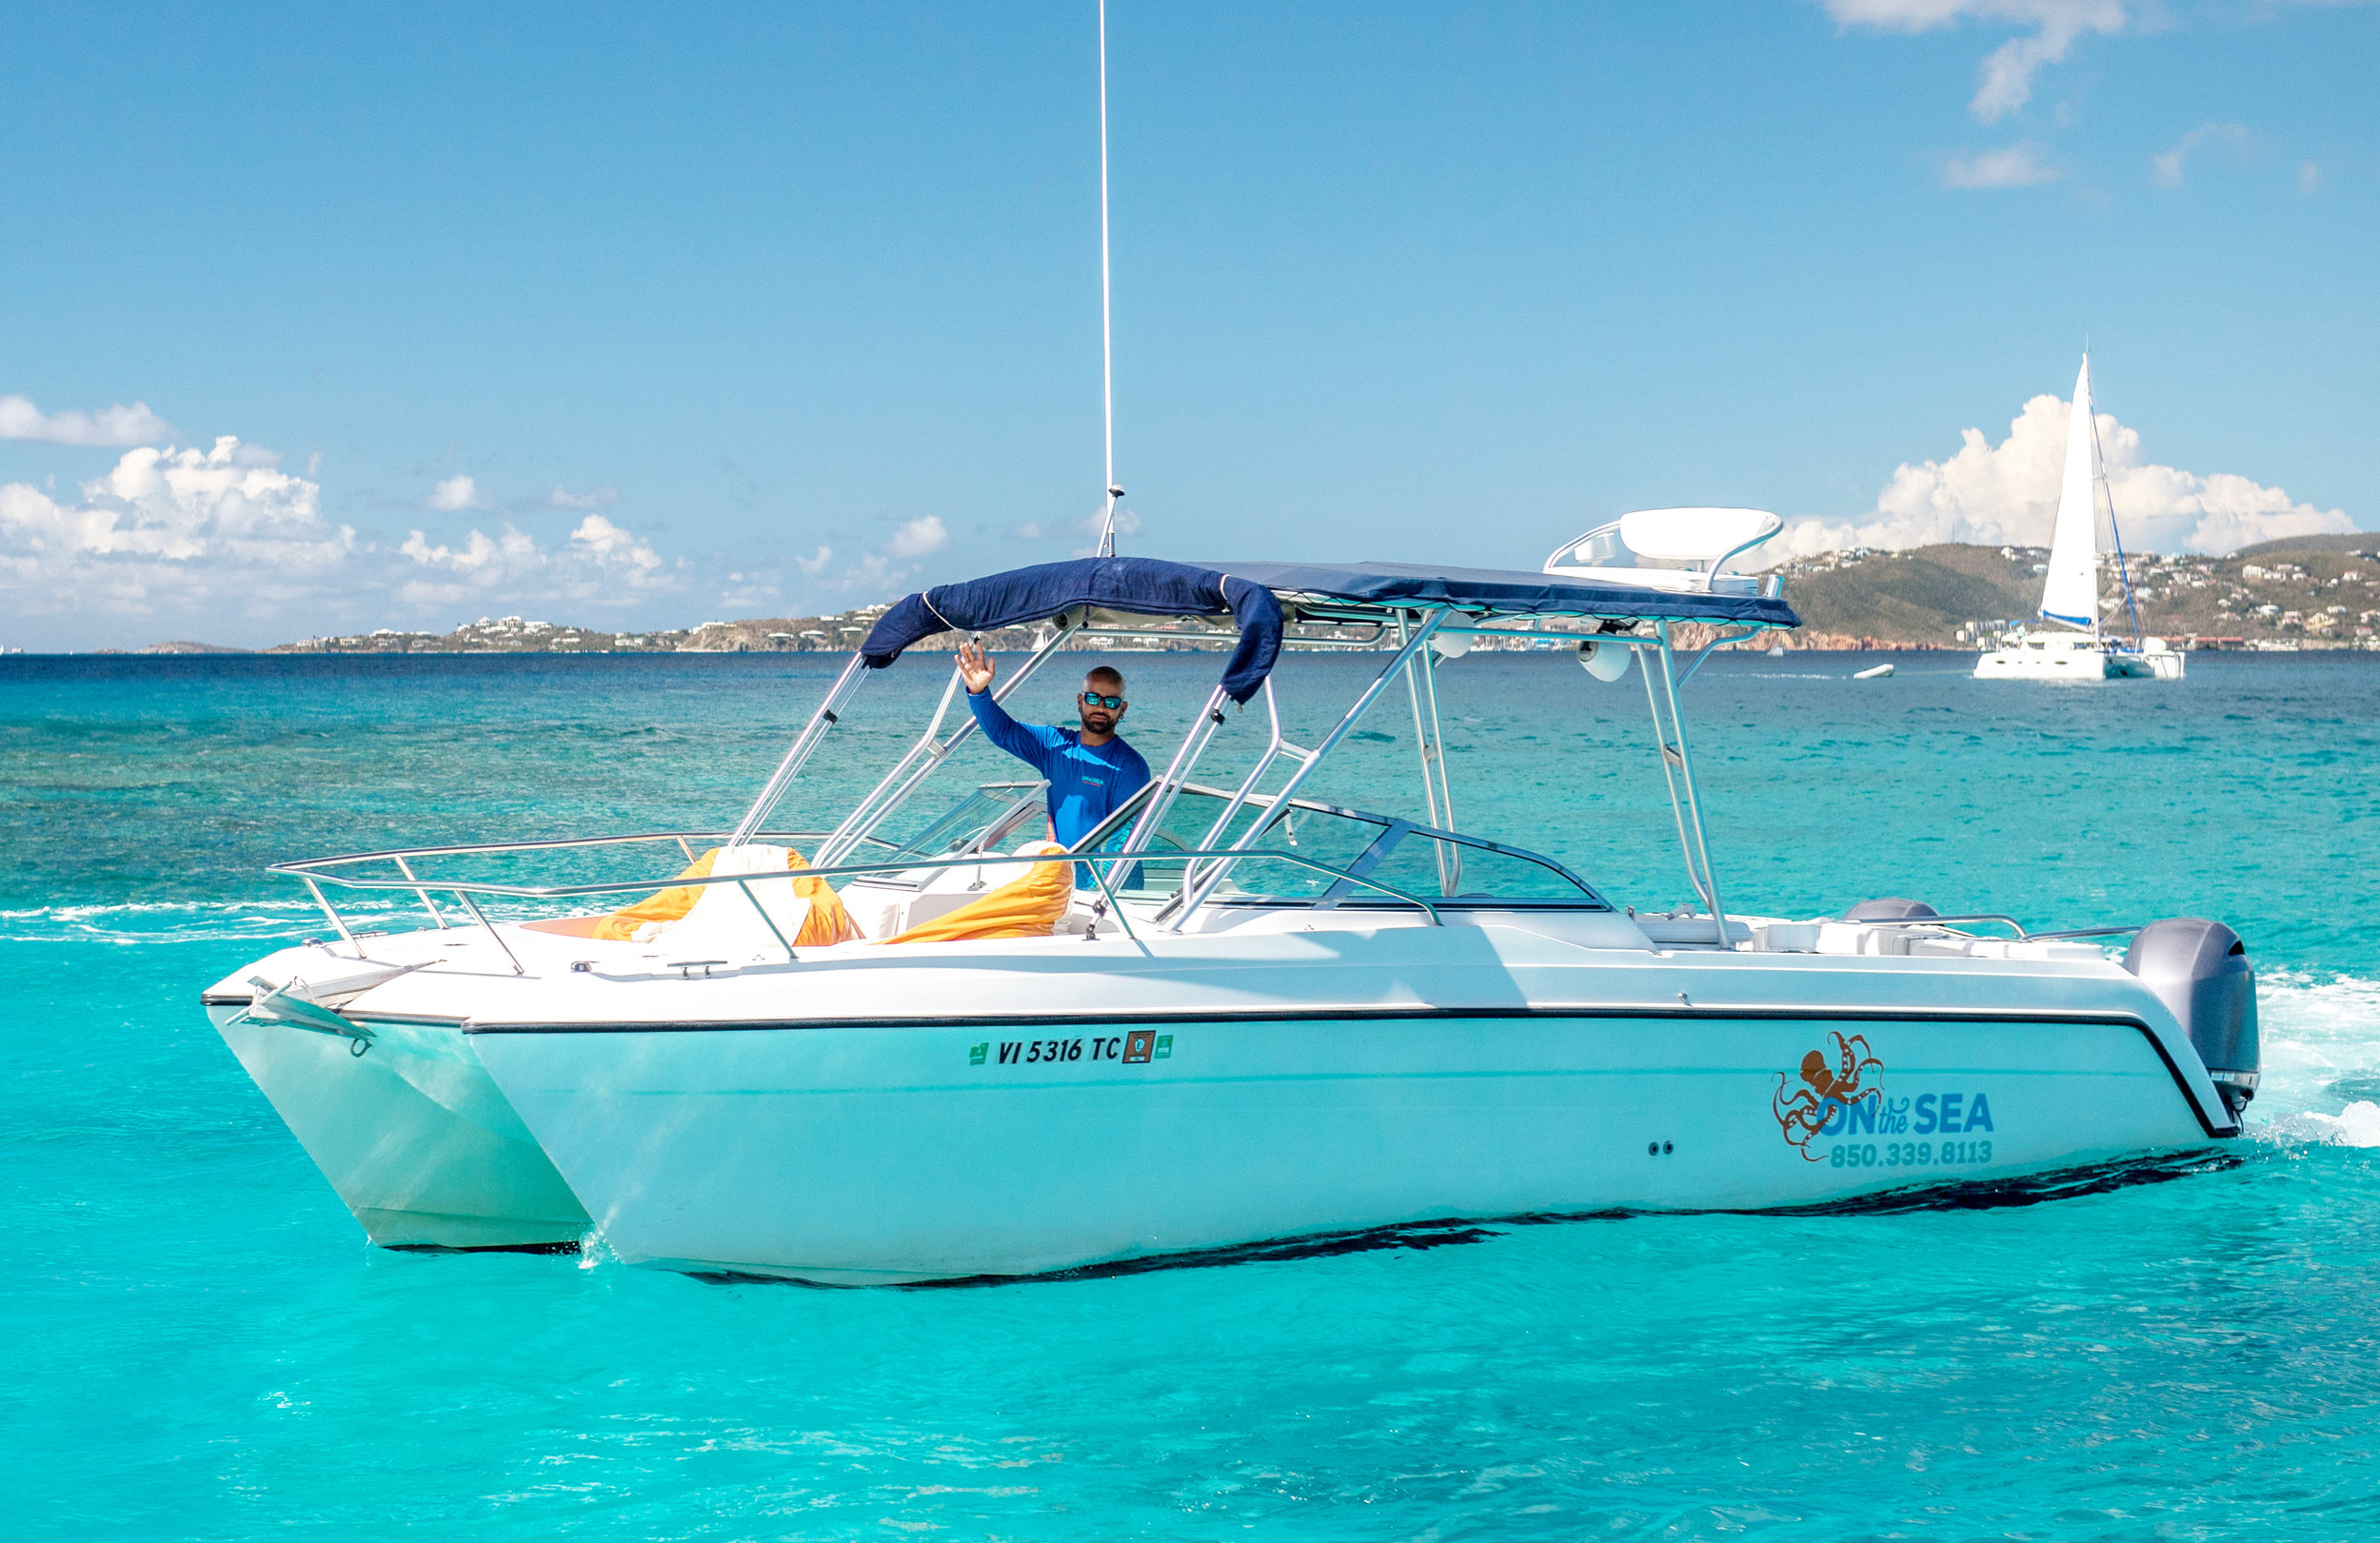 on-the-sea-charters-9-lives-4.jpg